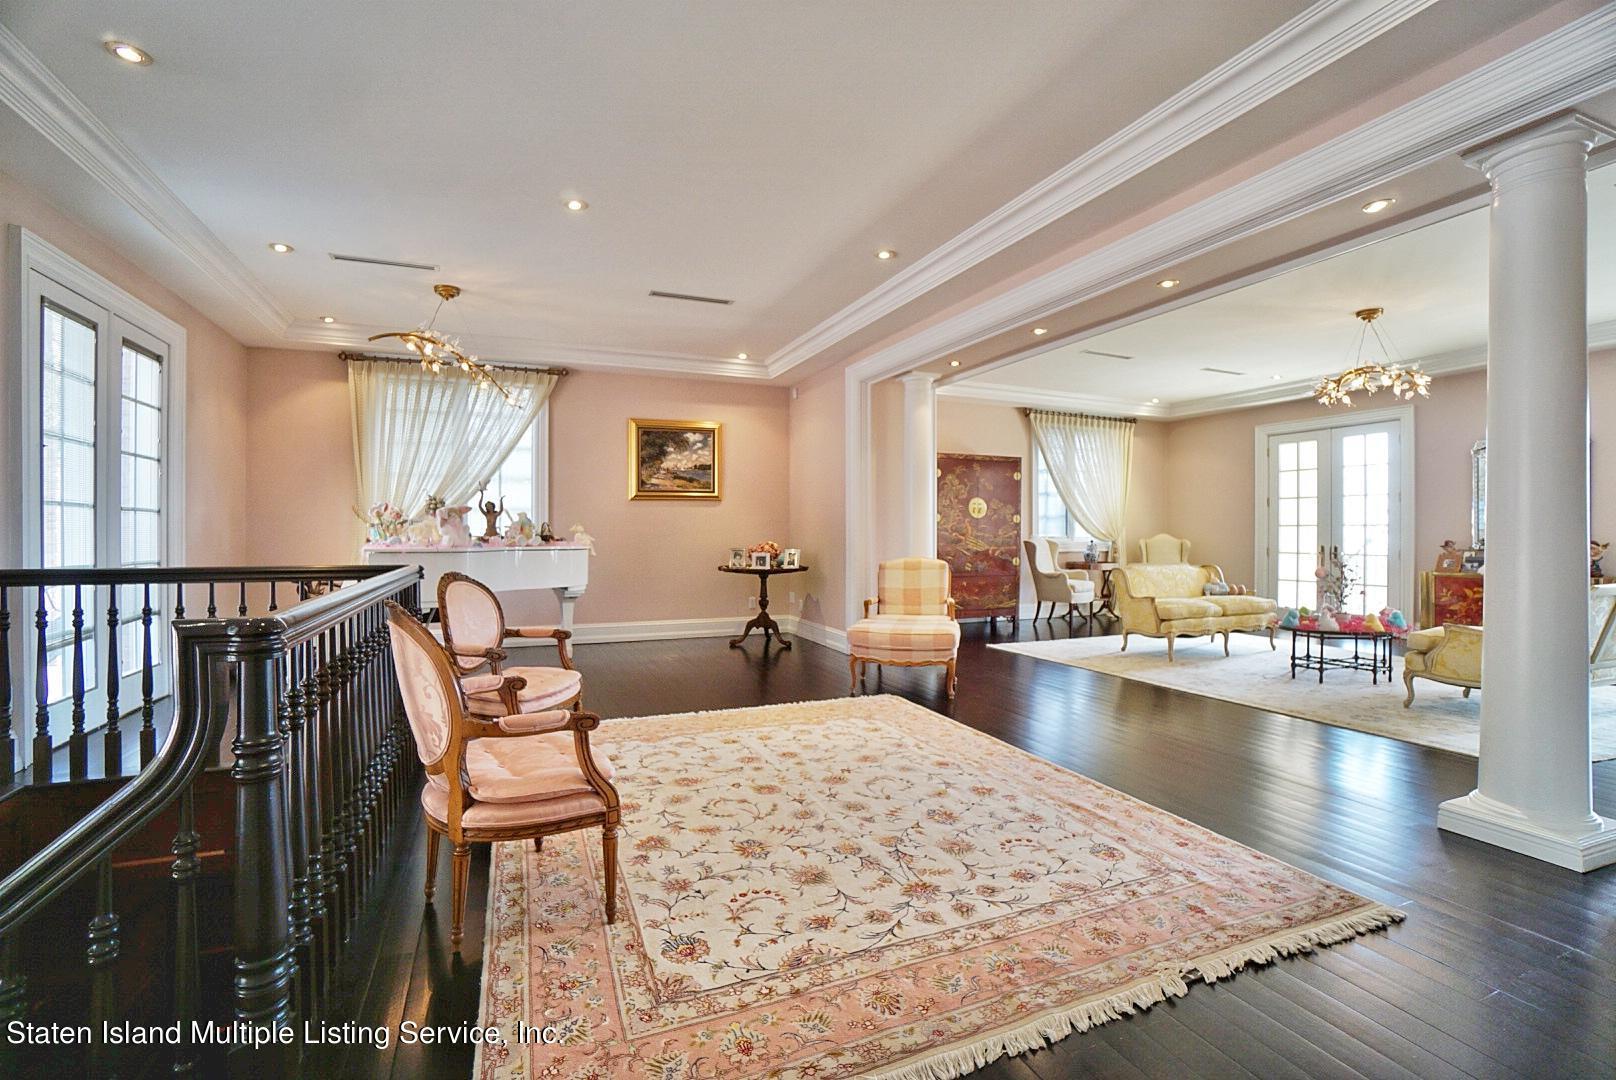 Single Family - Detached 129 Coverly Avenue   Staten Island, NY 10301, MLS-1144490-17